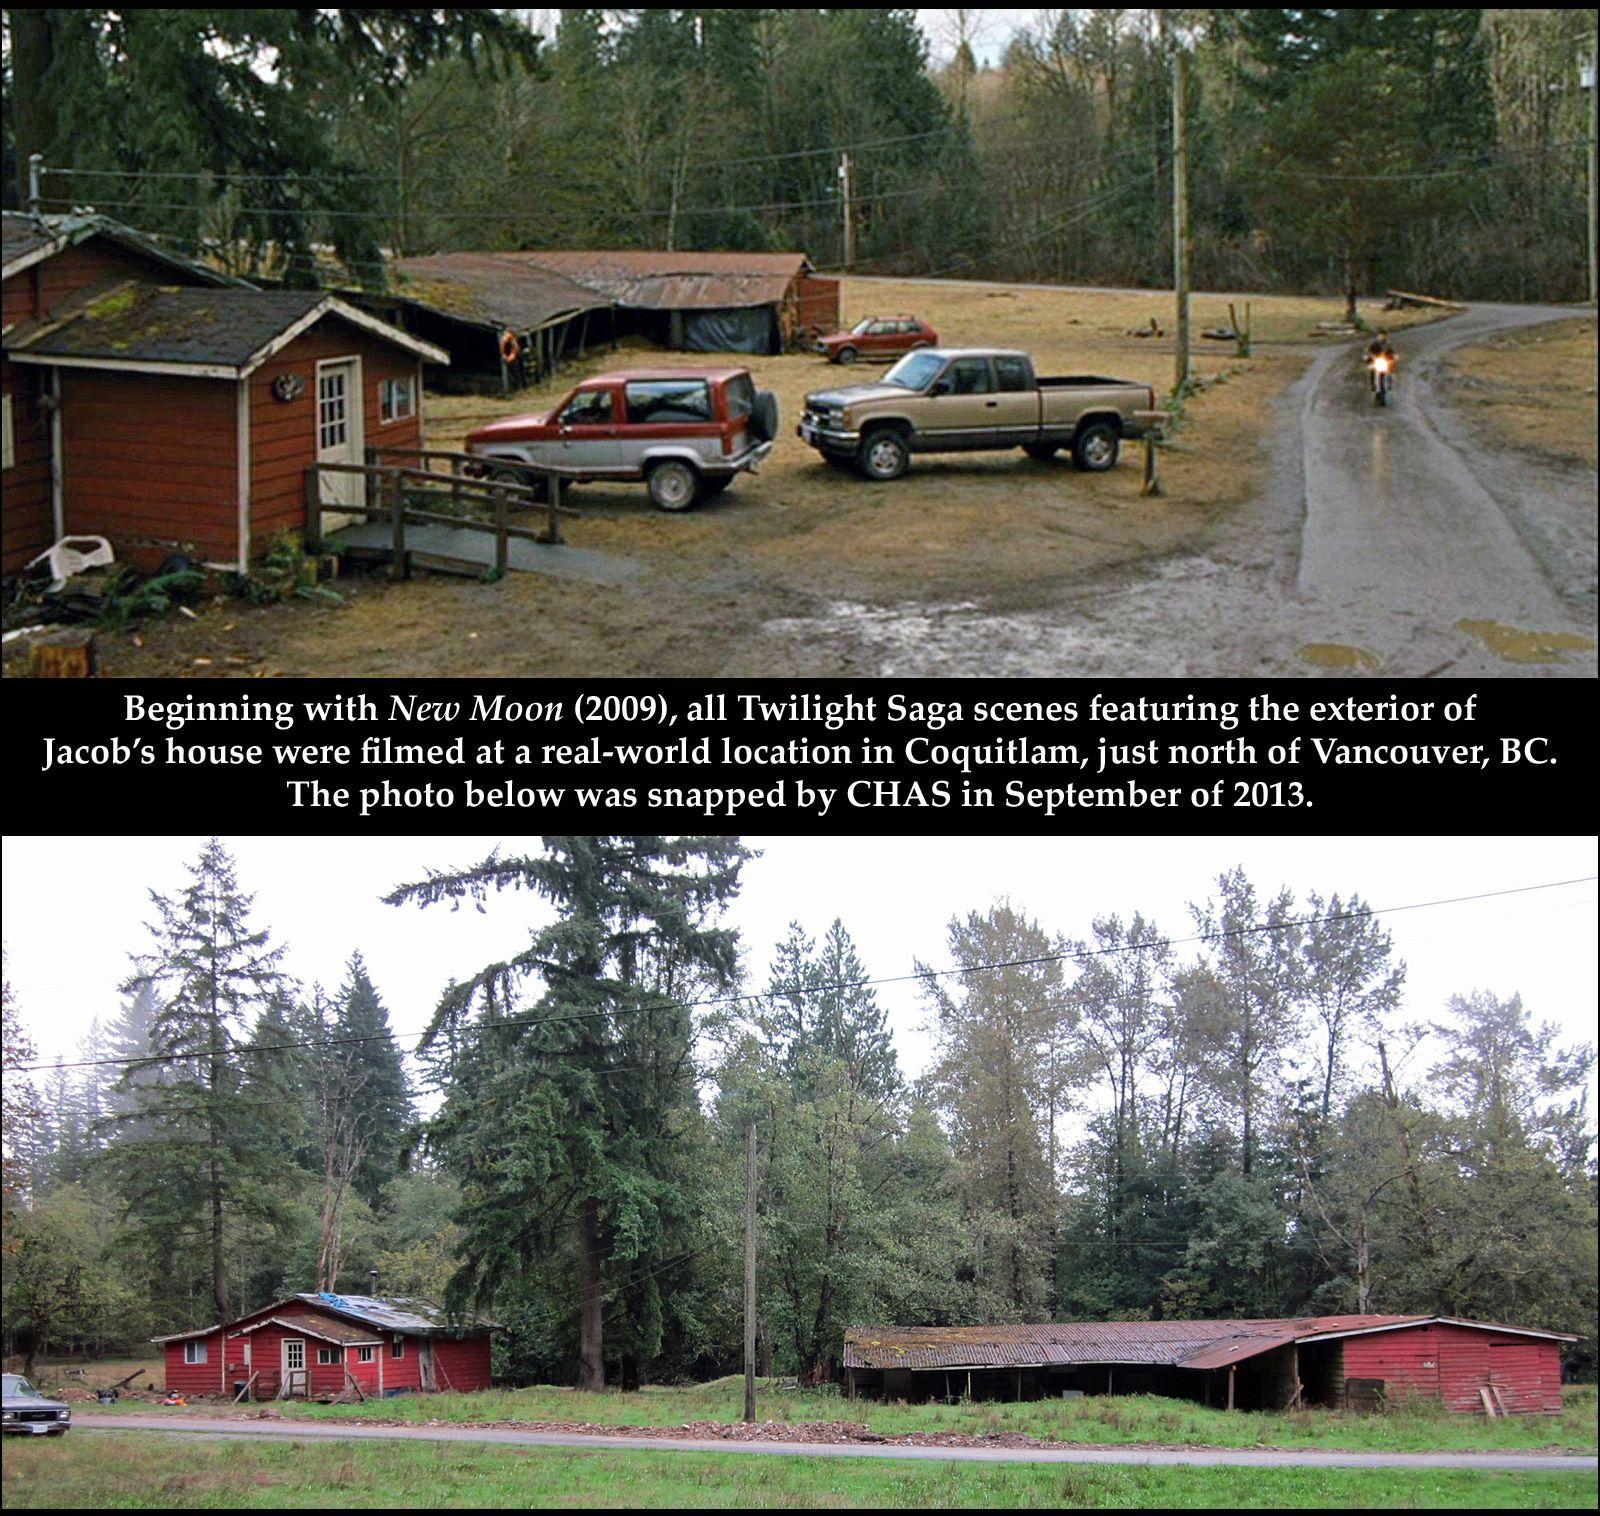 Jacob Black S Home Filming Locations Twilight Saga British Columbia